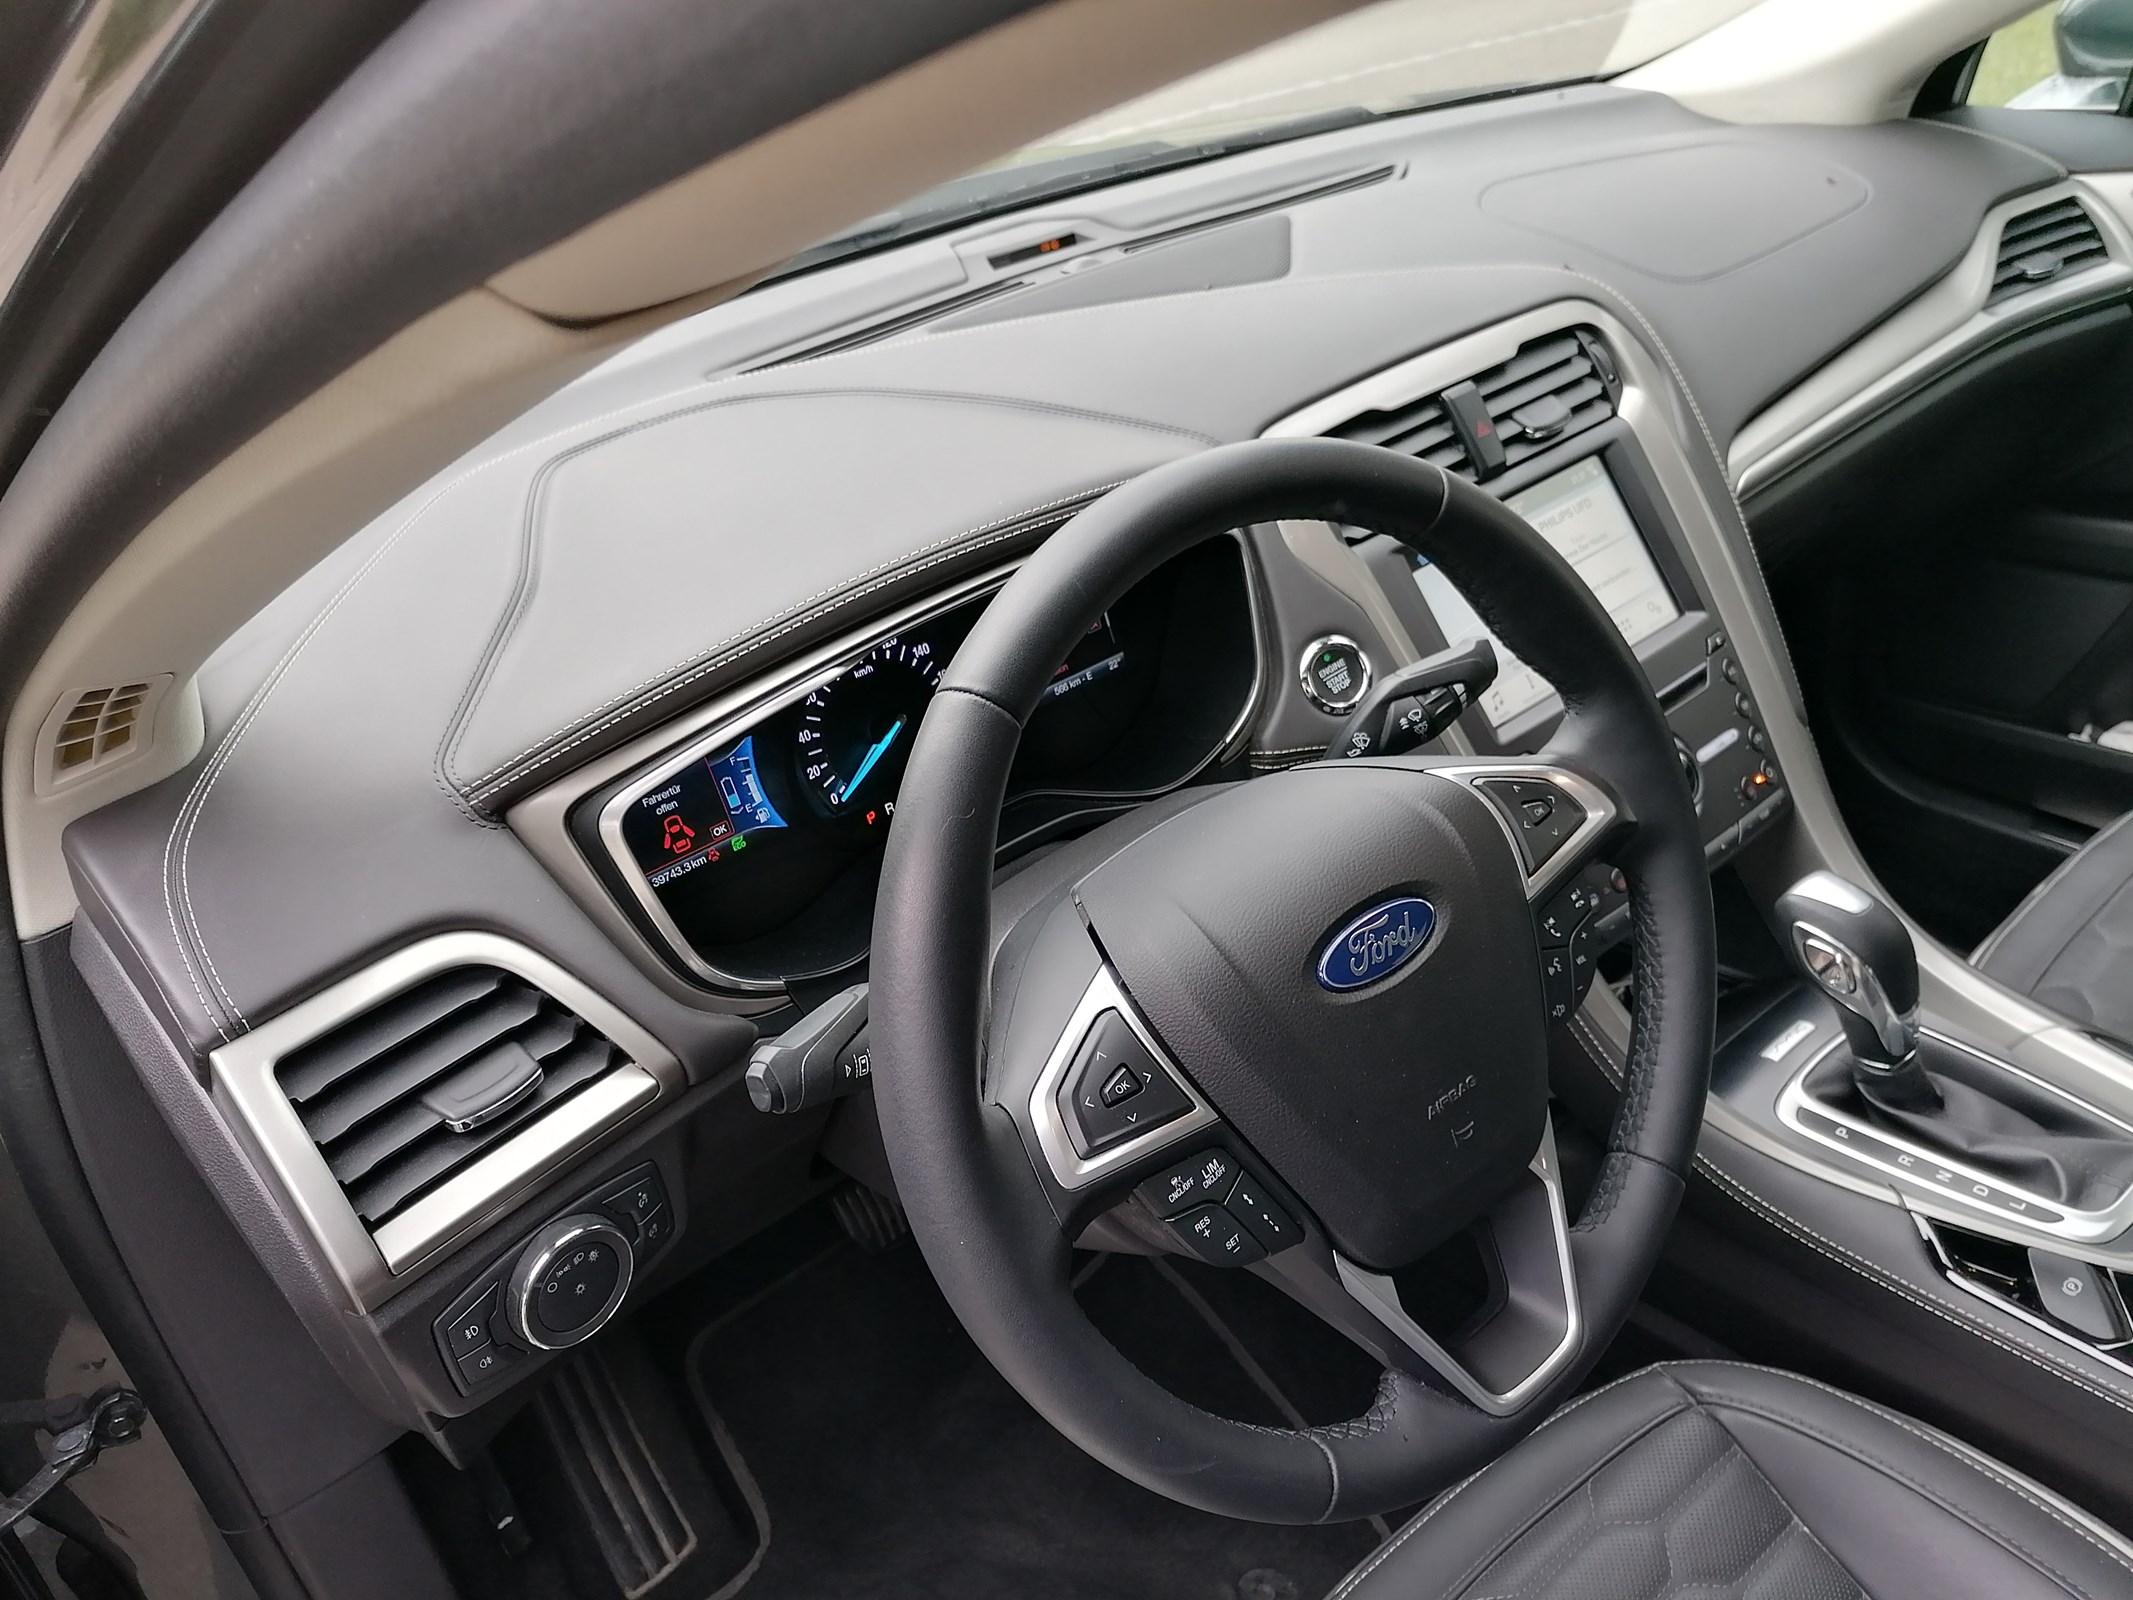 Ford Mondeo 2.0 HEV 187 Vignale